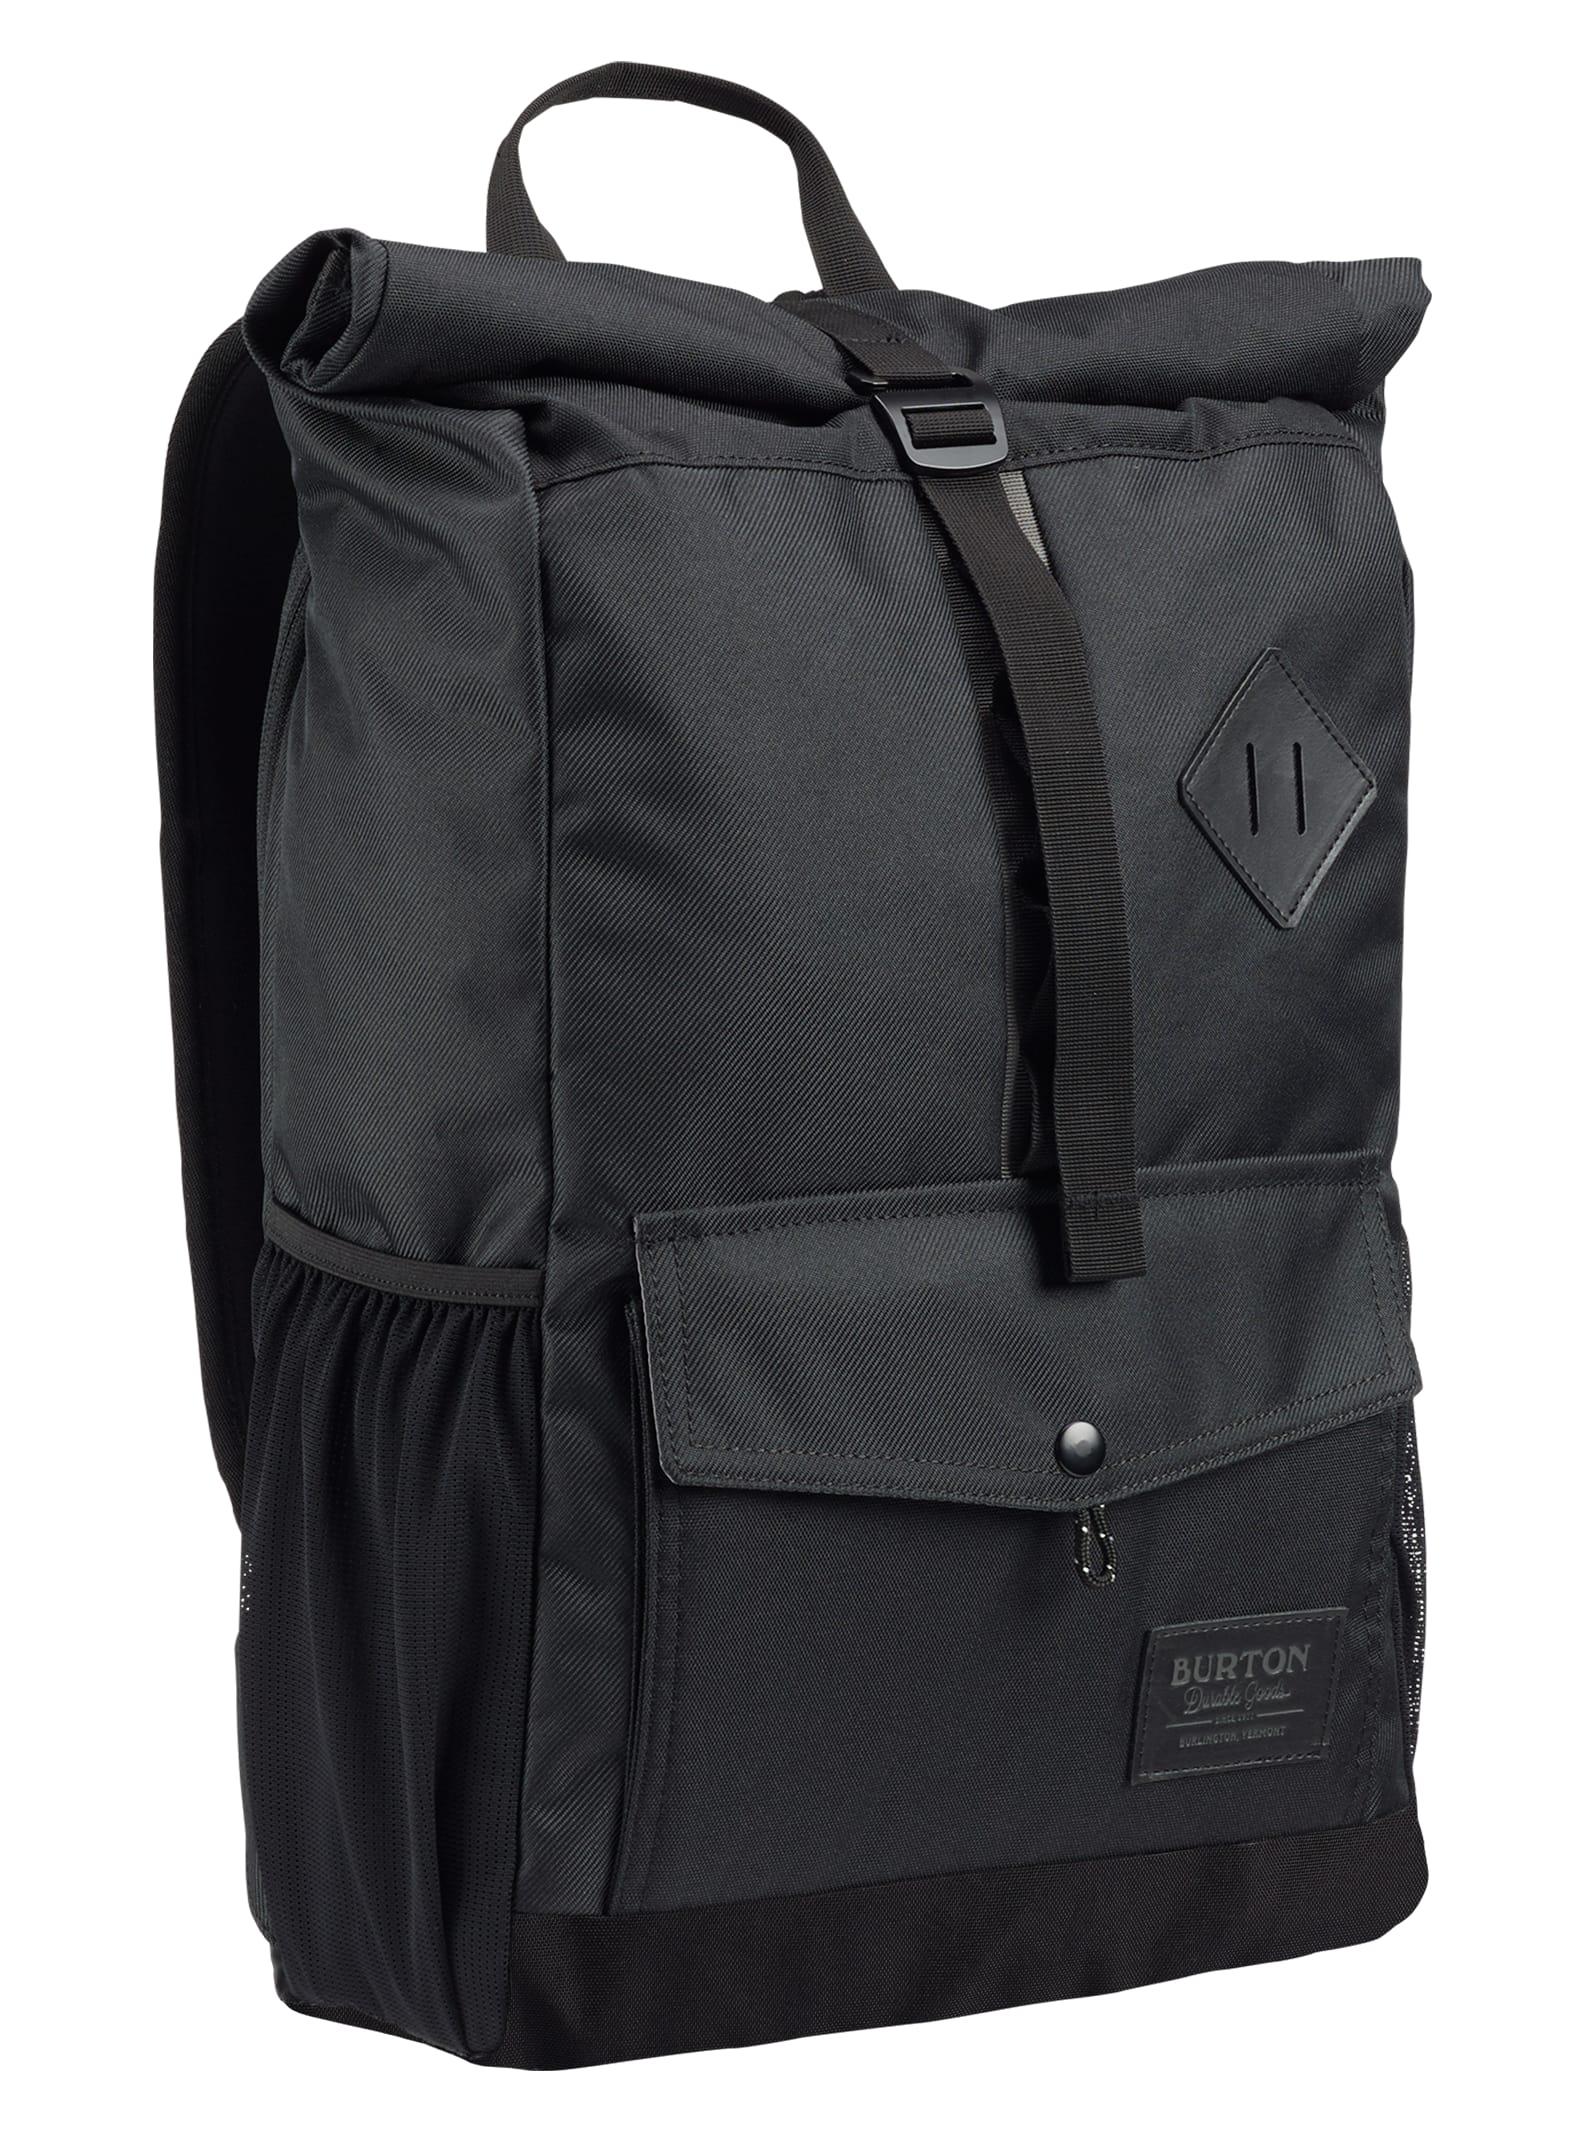 Backpacks  9e6a9791f8c14